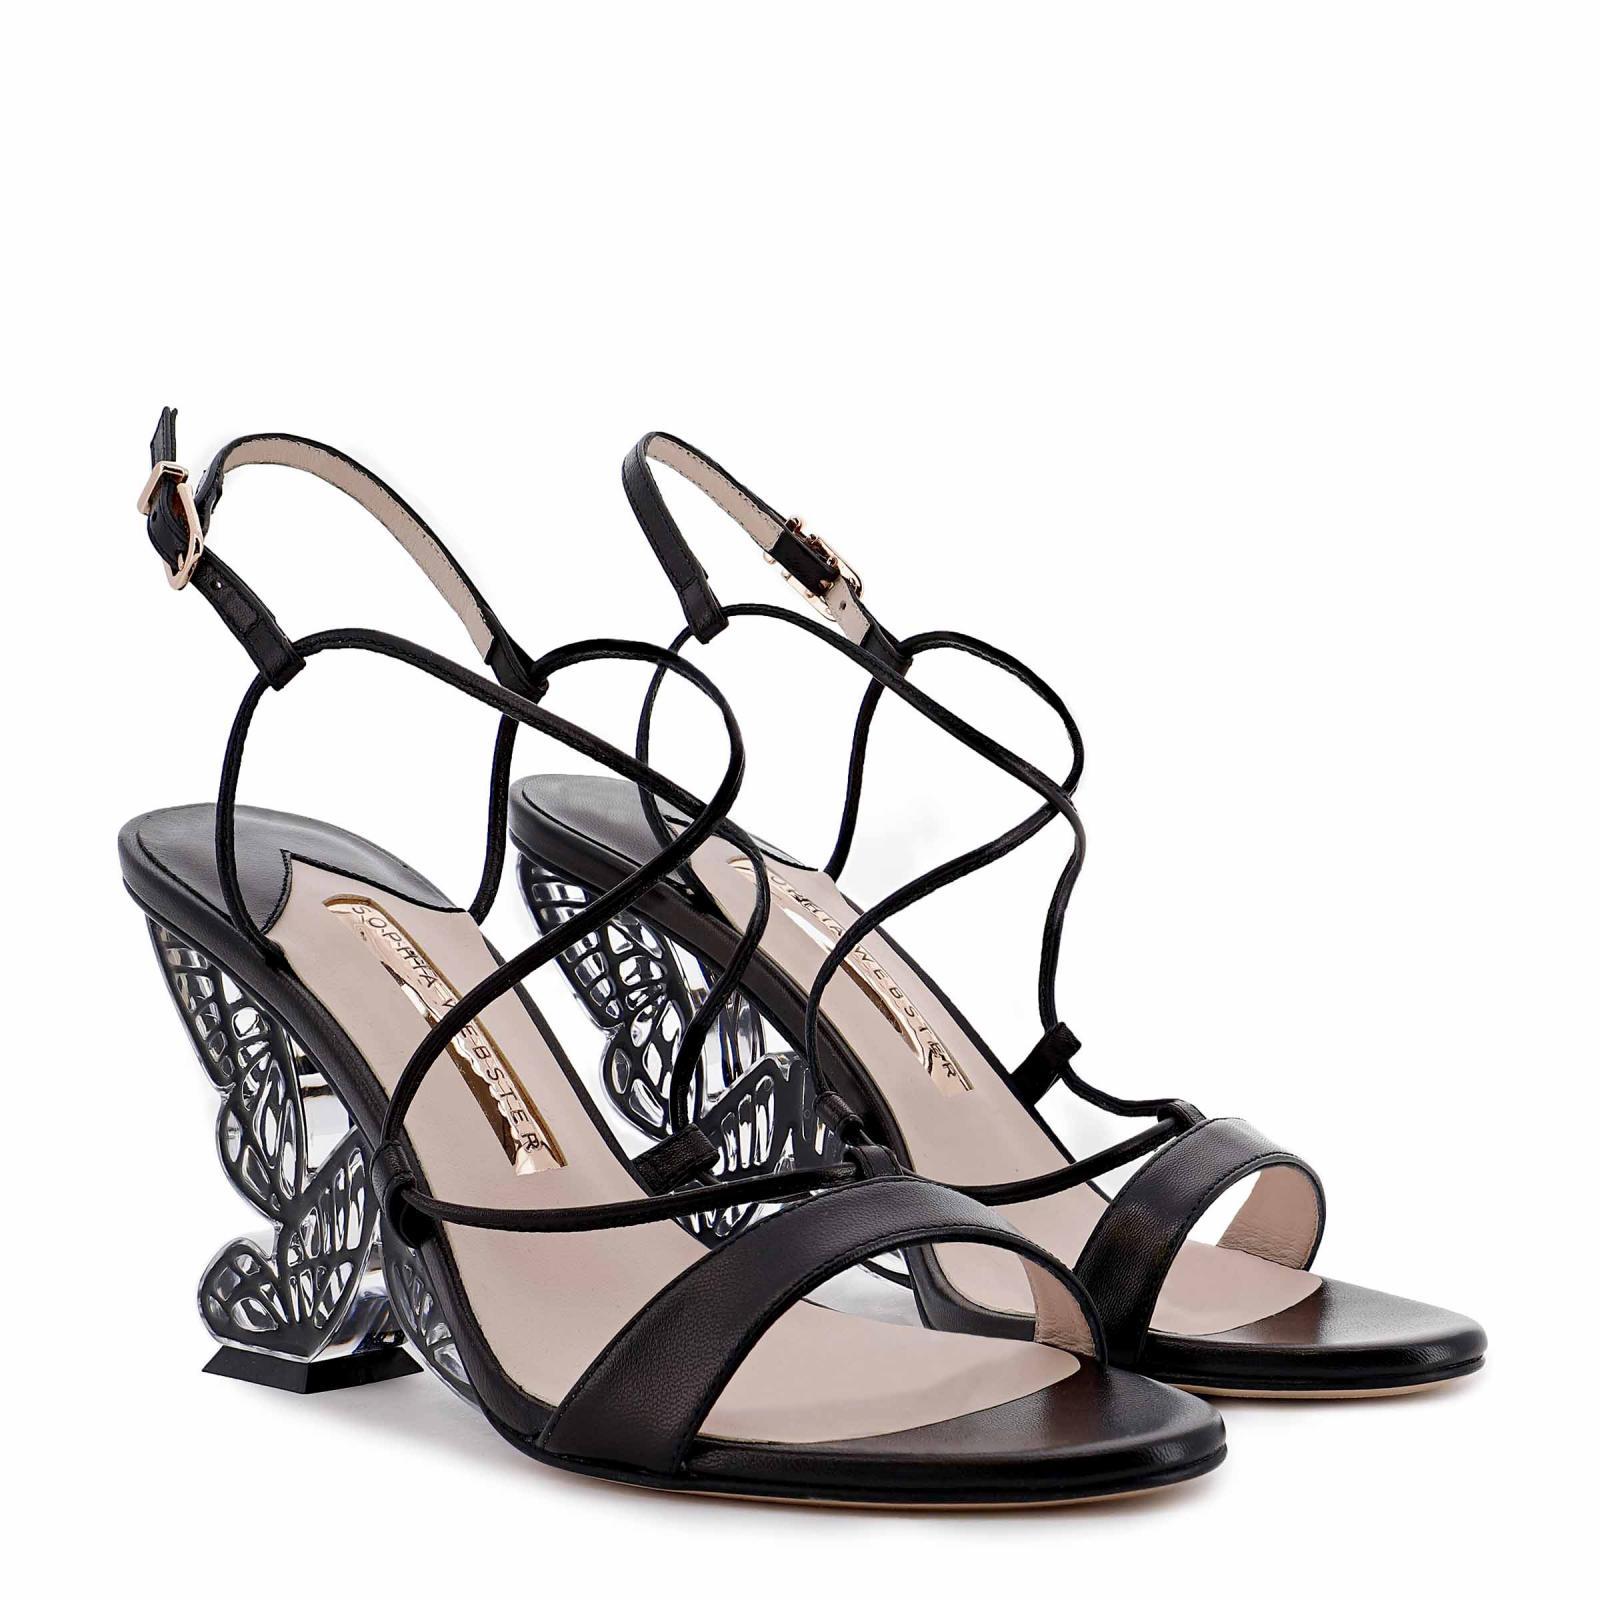 SOPHIA WEBSTER - PALOMA 85 sandali